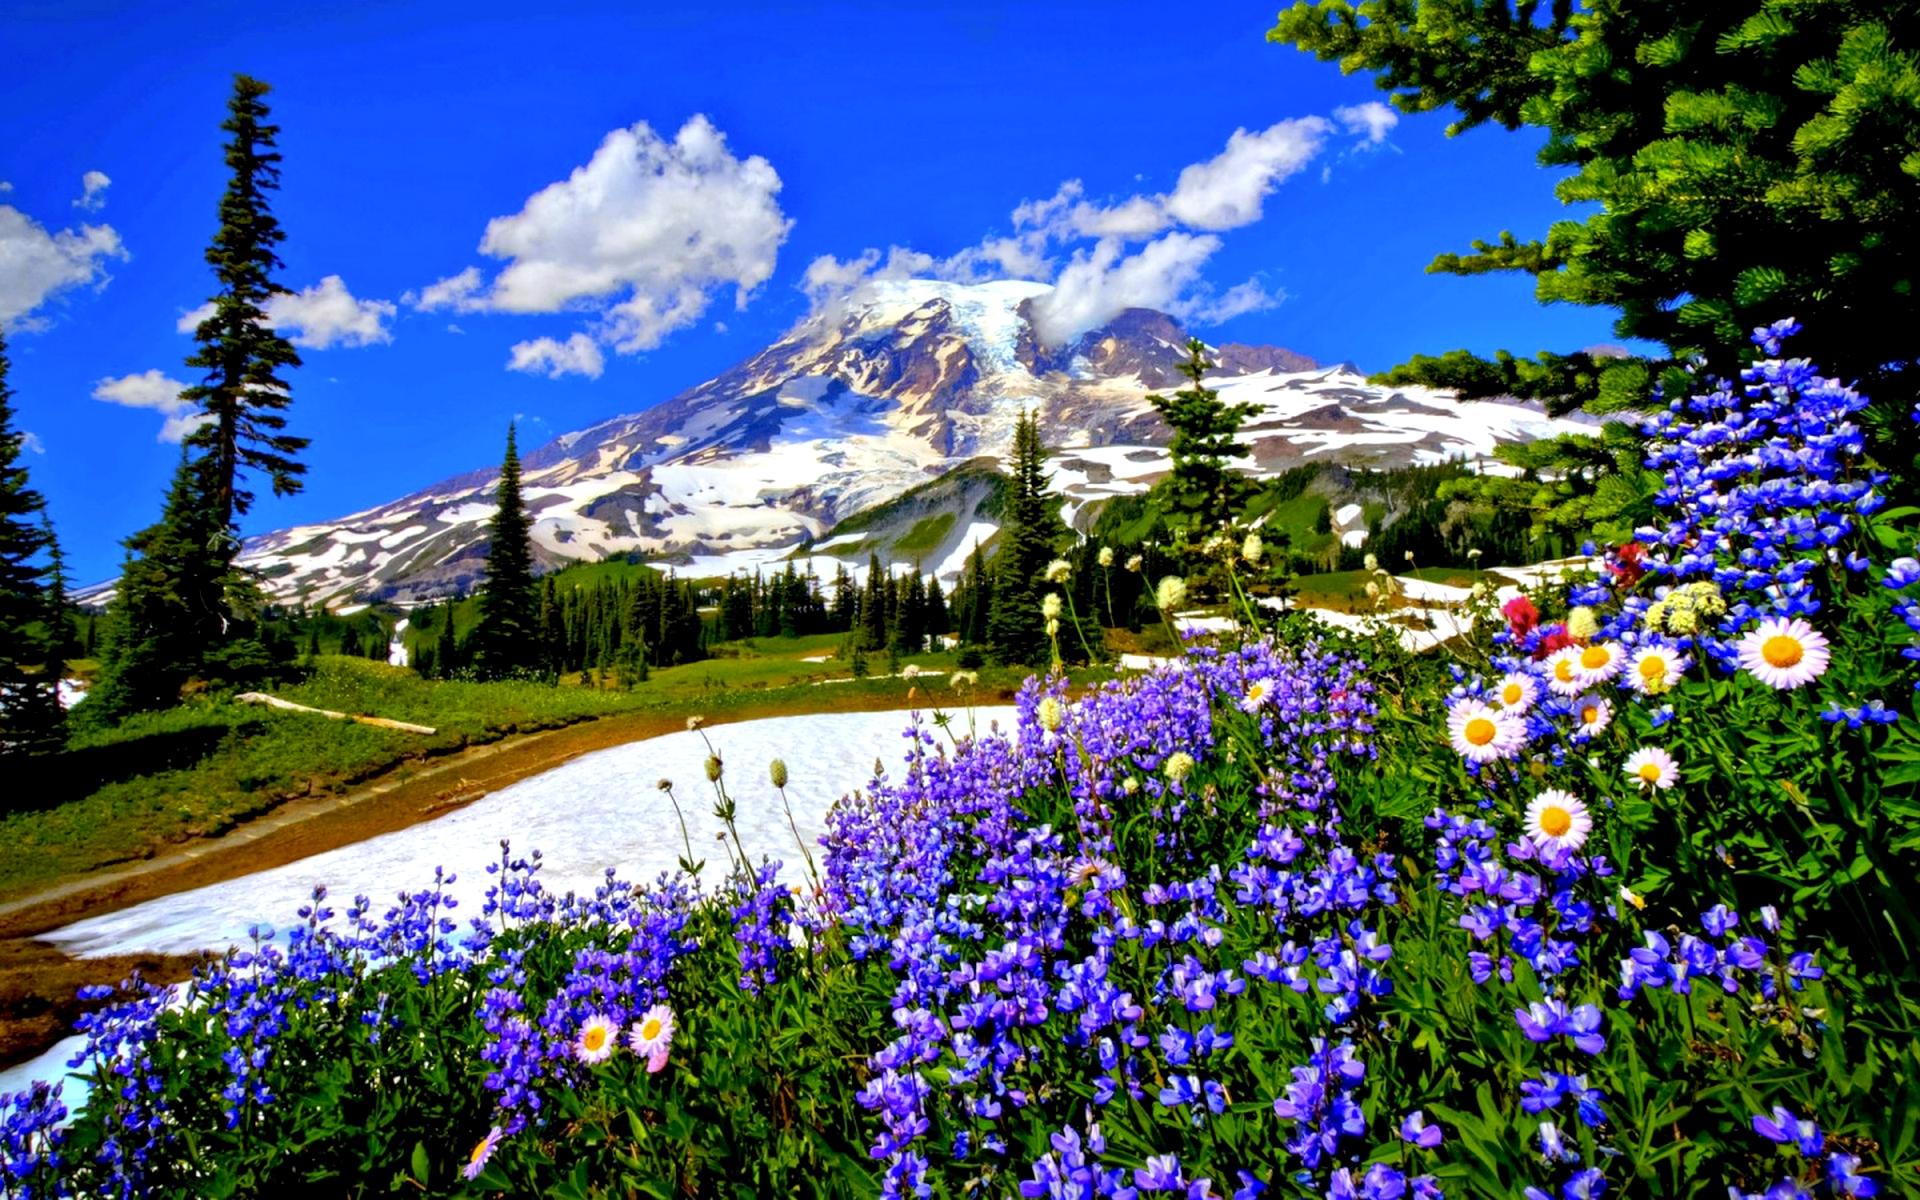 Good Wallpaper Mountain Flower - types-of-mountain-flowers-17-widescreen-wallpaper  Graphic_93861.jpg